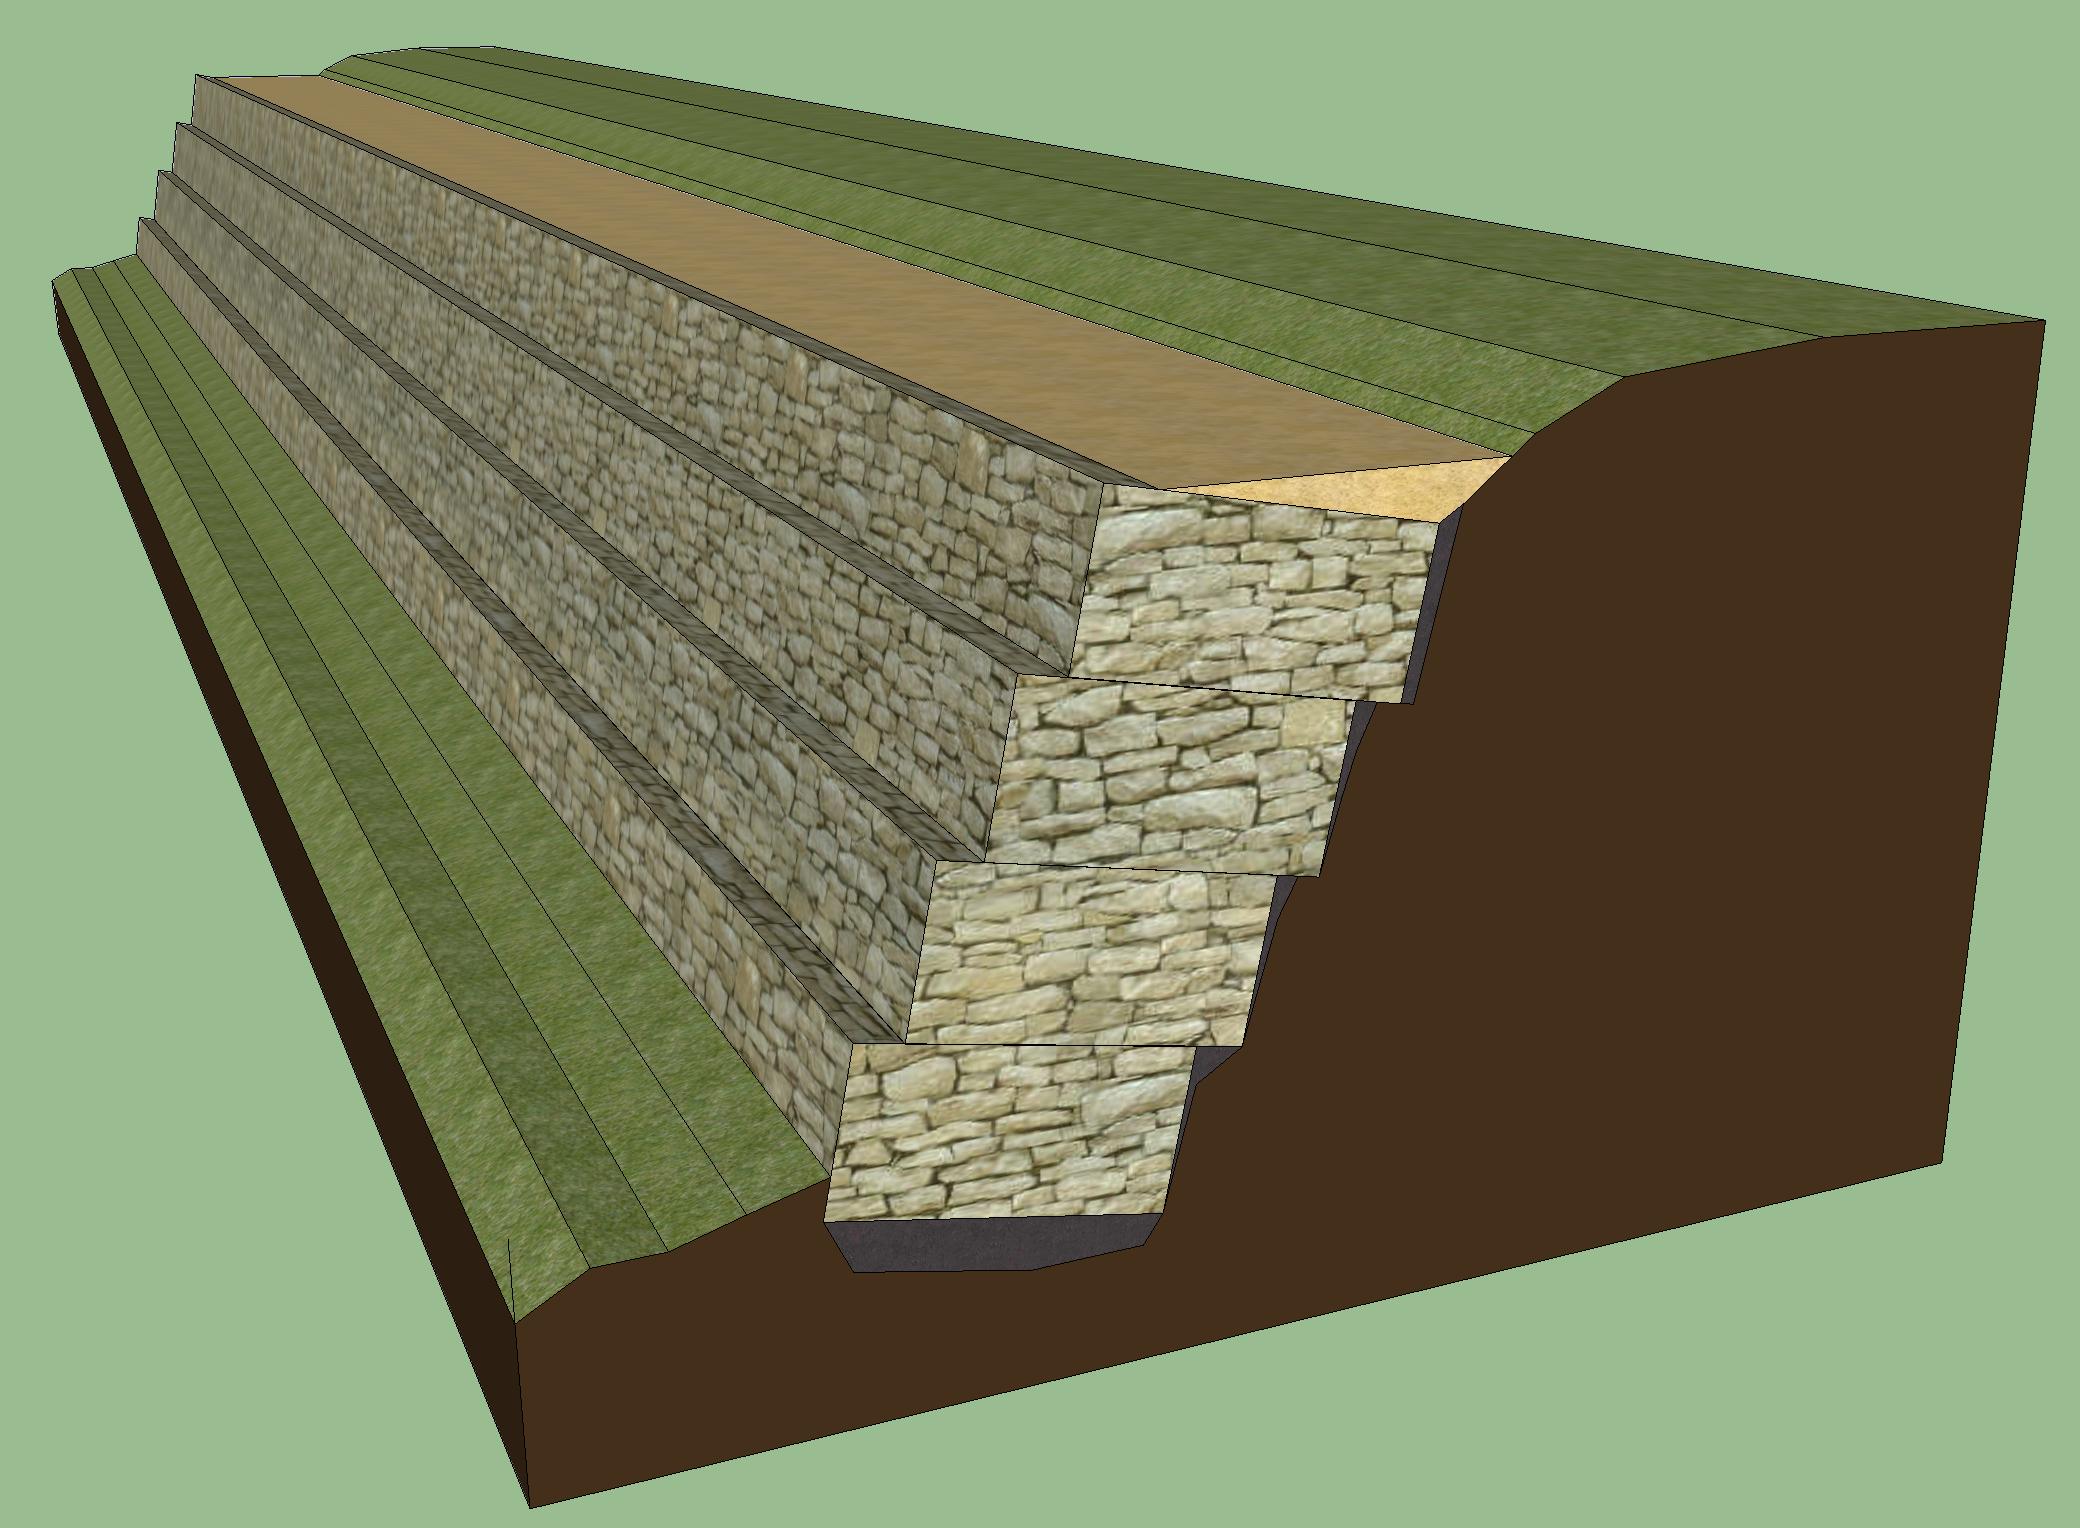 Reclined Gabion Wall- Steep Slope